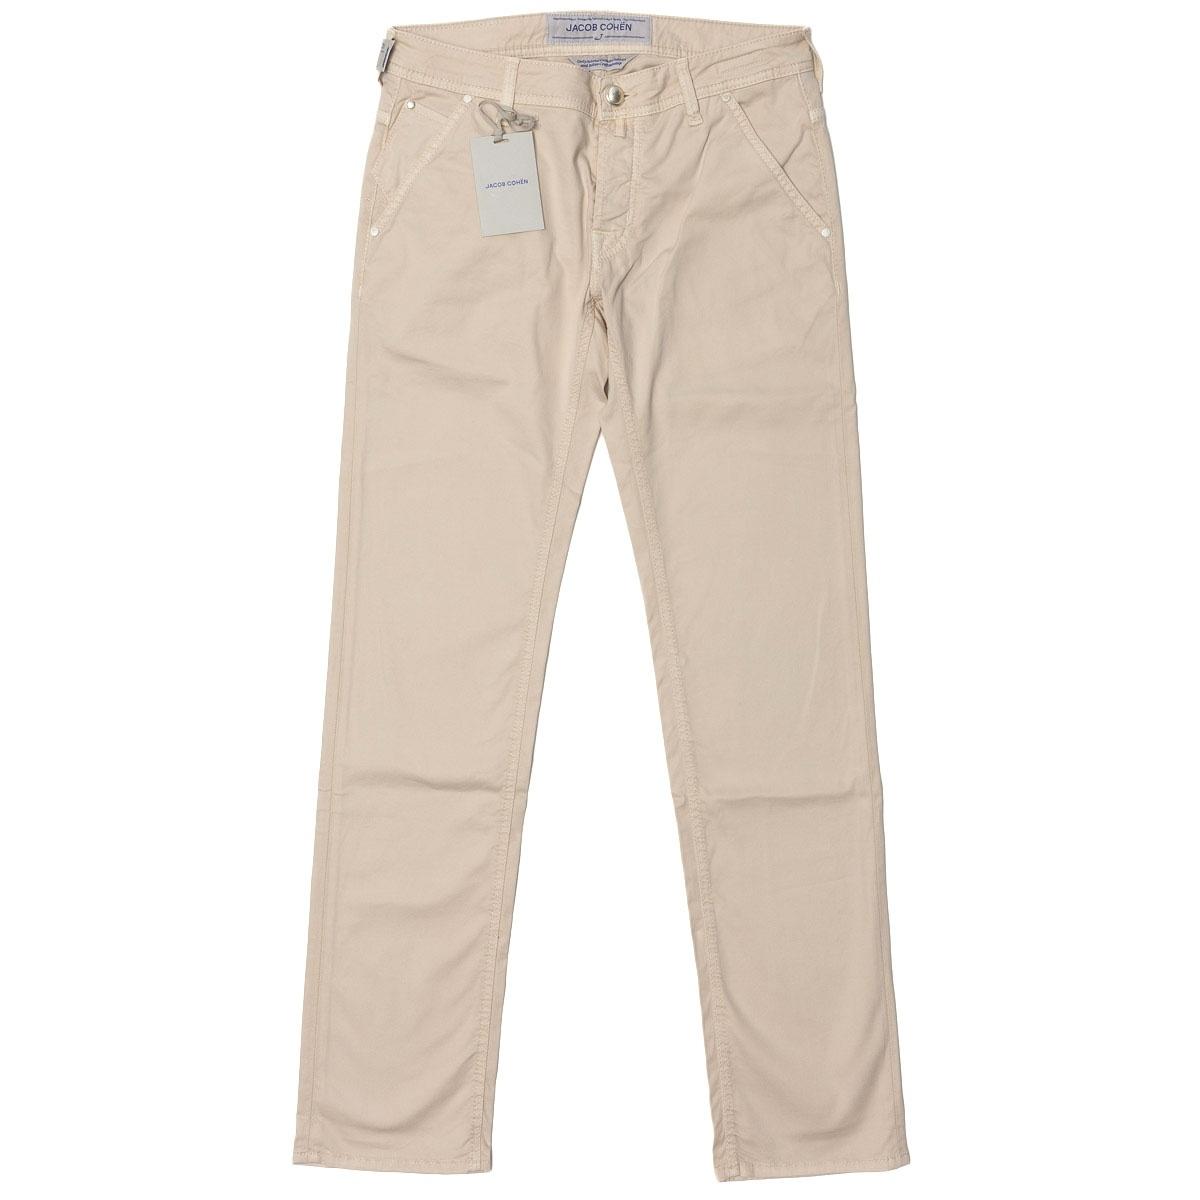 J613 Jeans-1